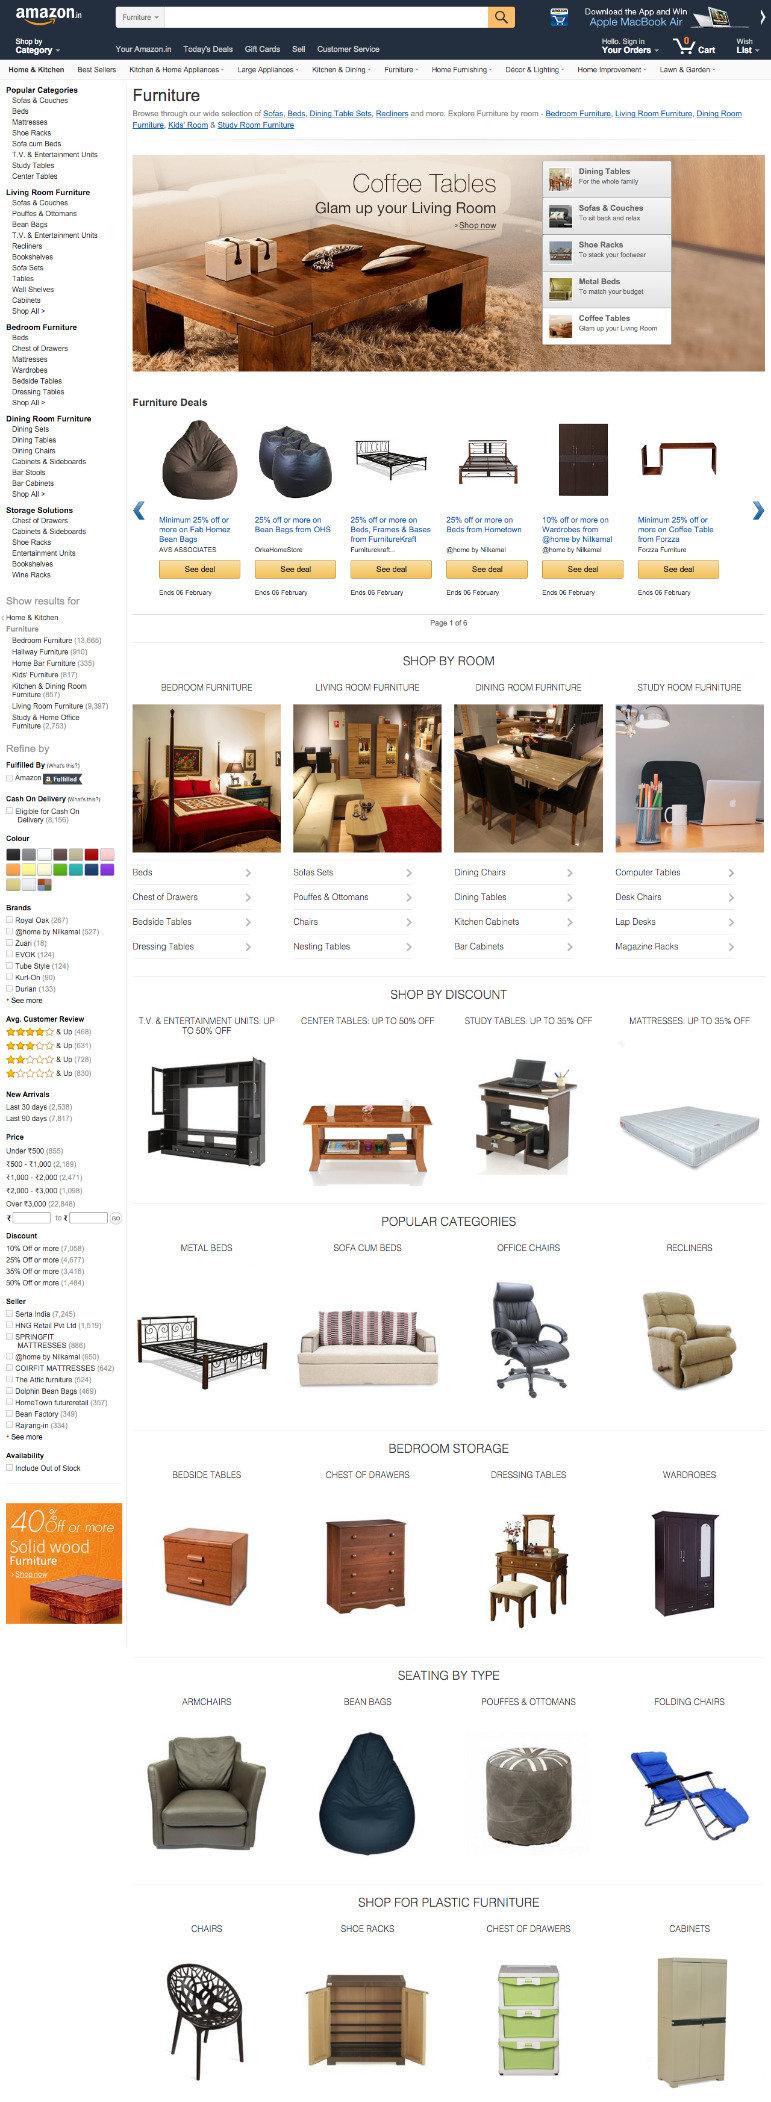 Furniture_edited.jpg